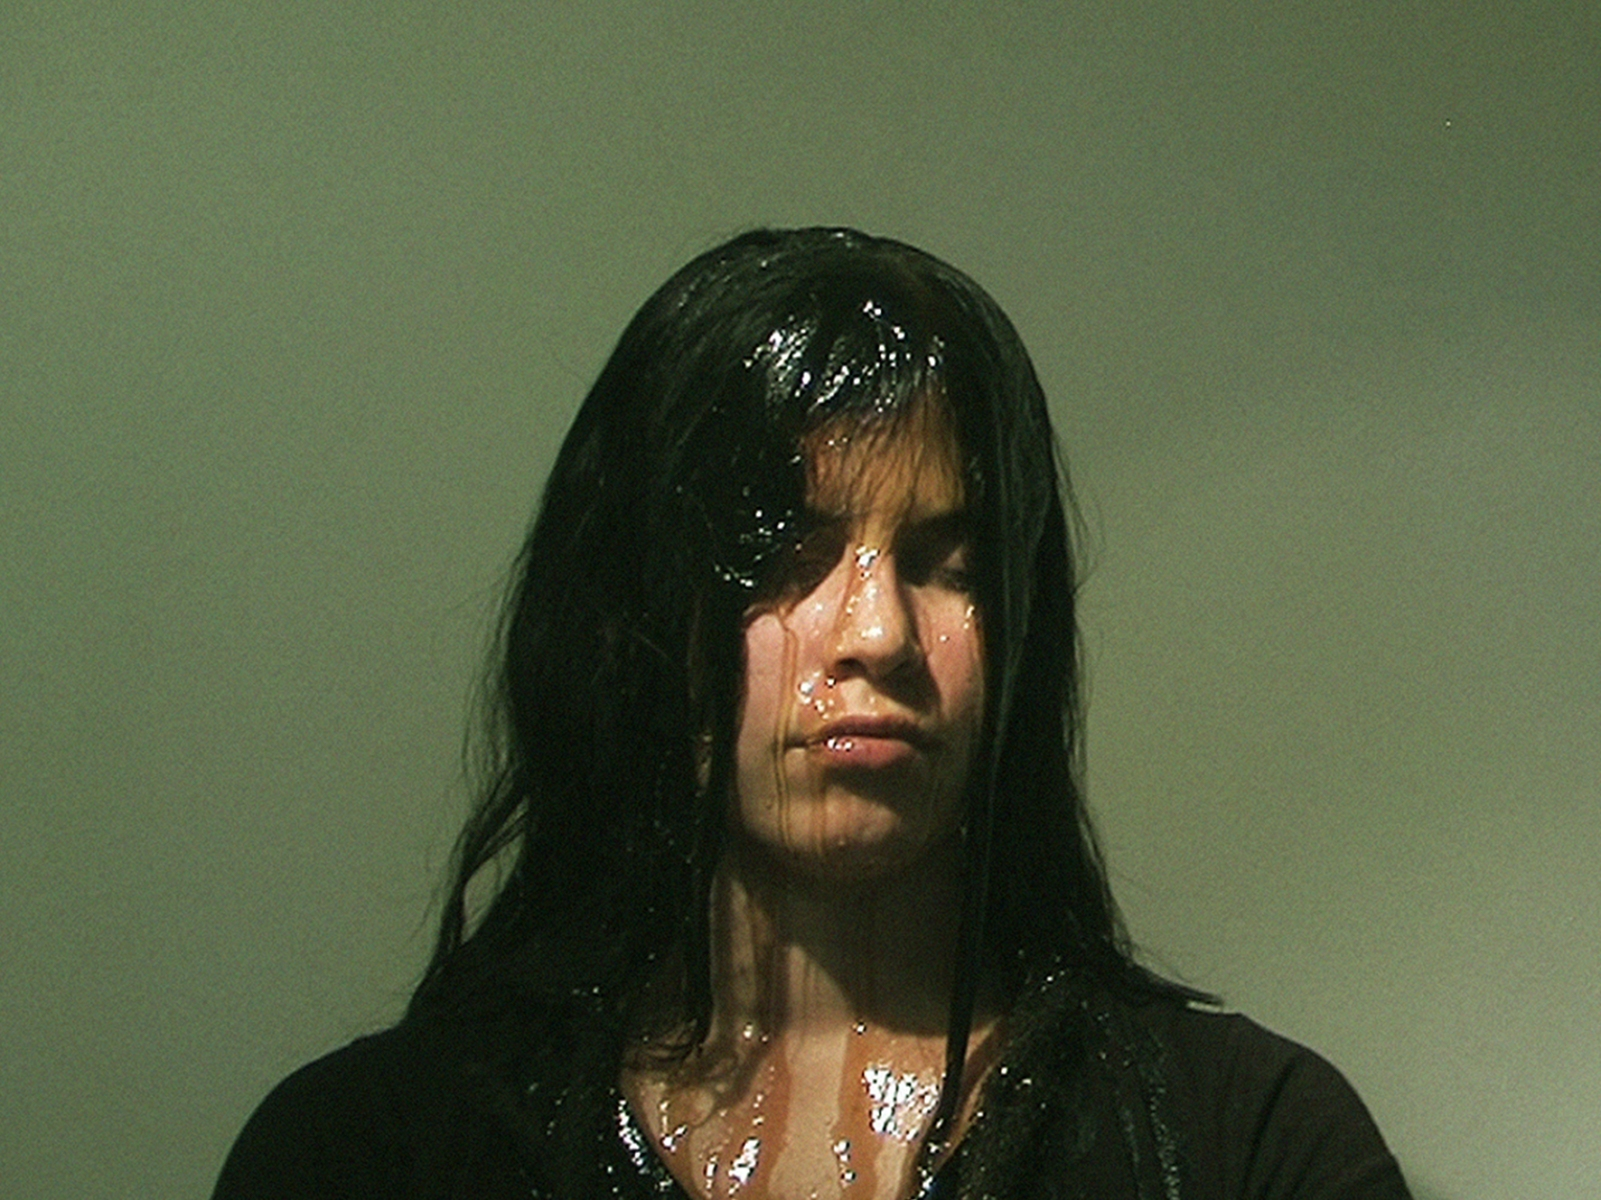 9. A drop of honey, 2013 - Performance, Video Still (Naivy Perez)